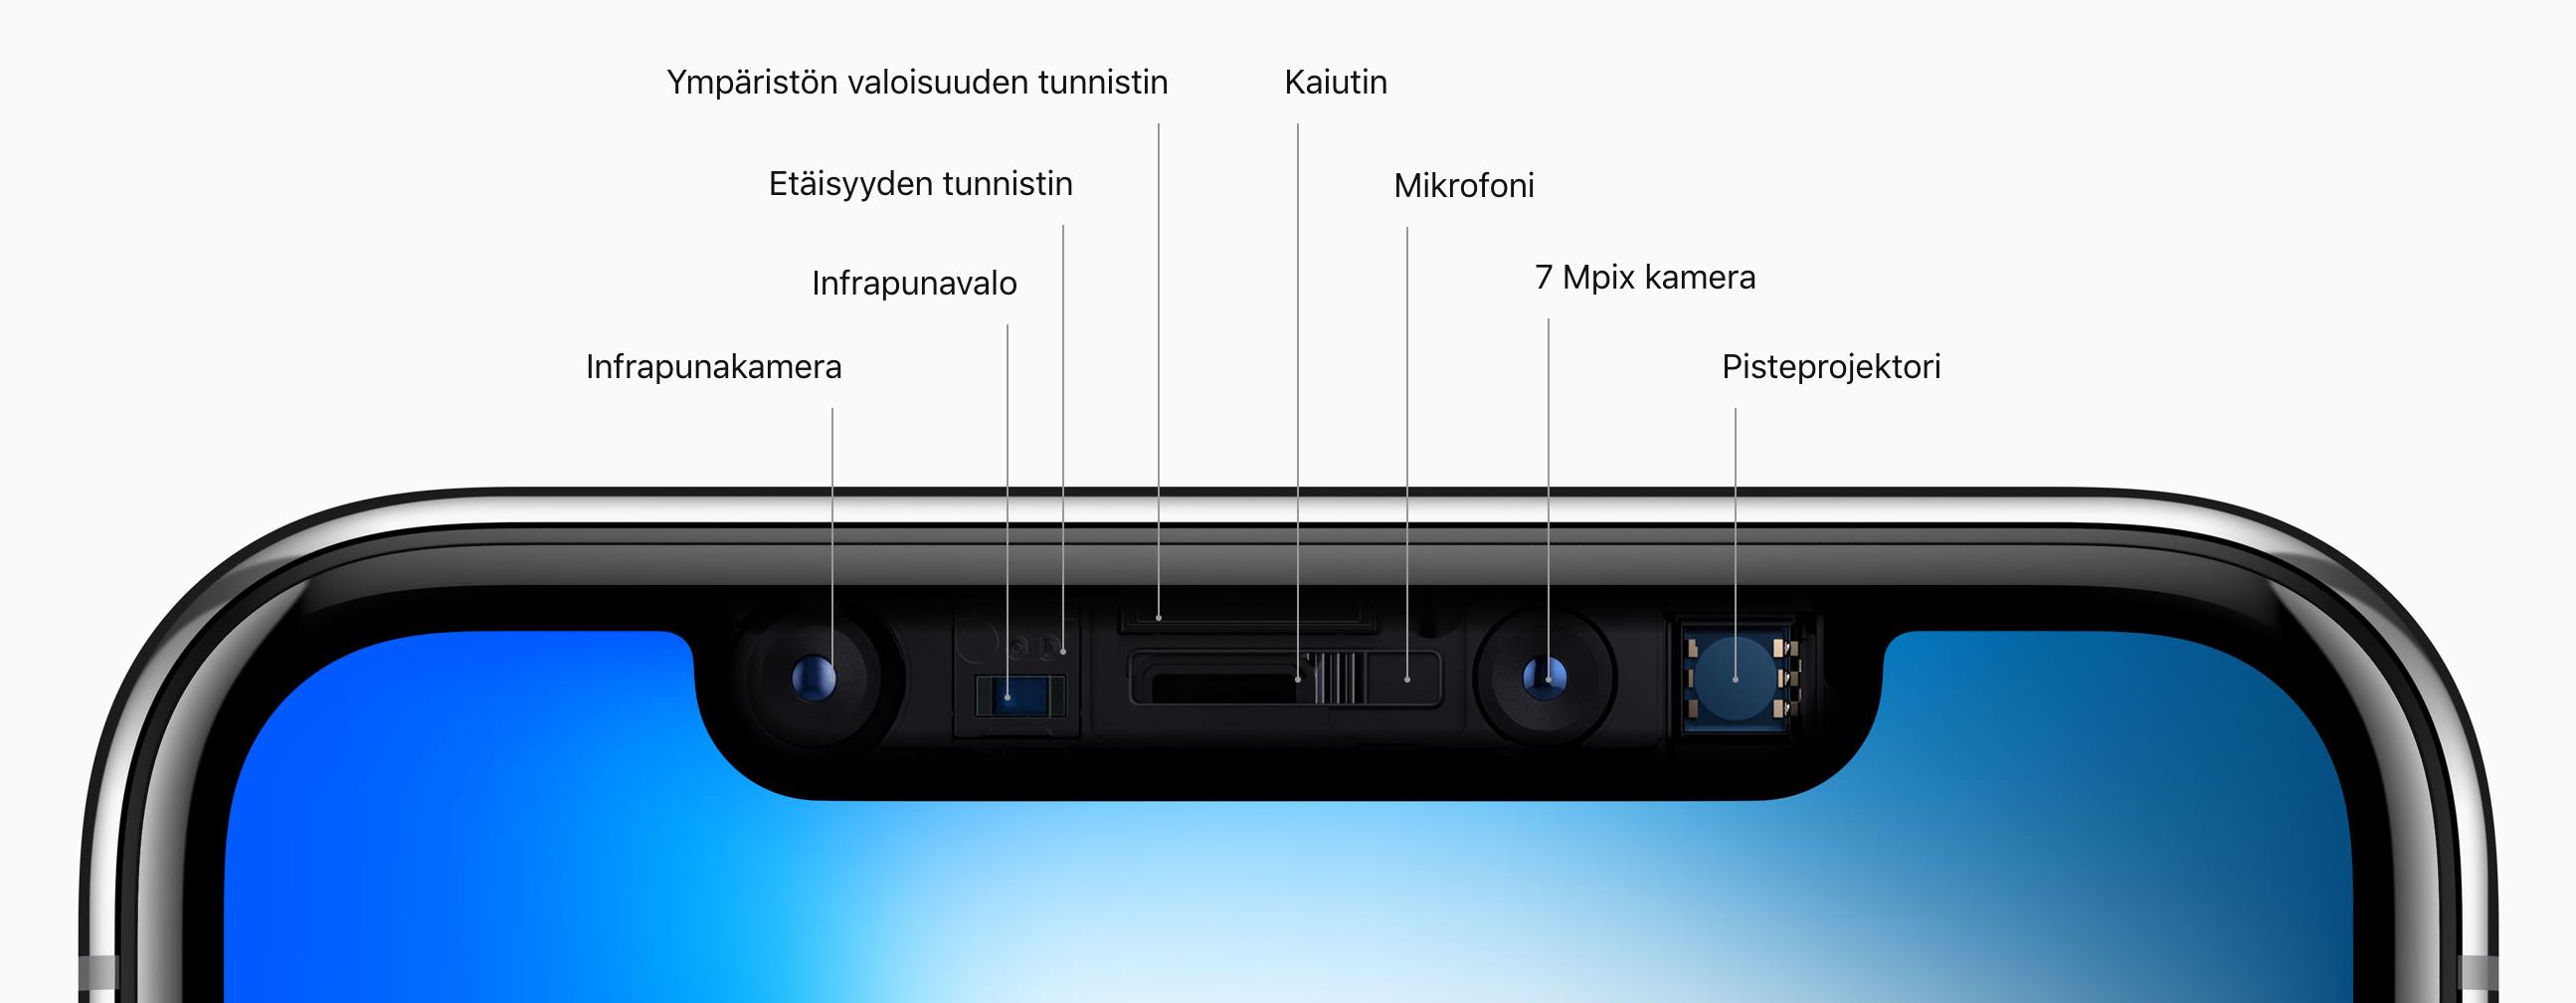 iPhone X:n etukameraa tukevat infrapunasensorit.